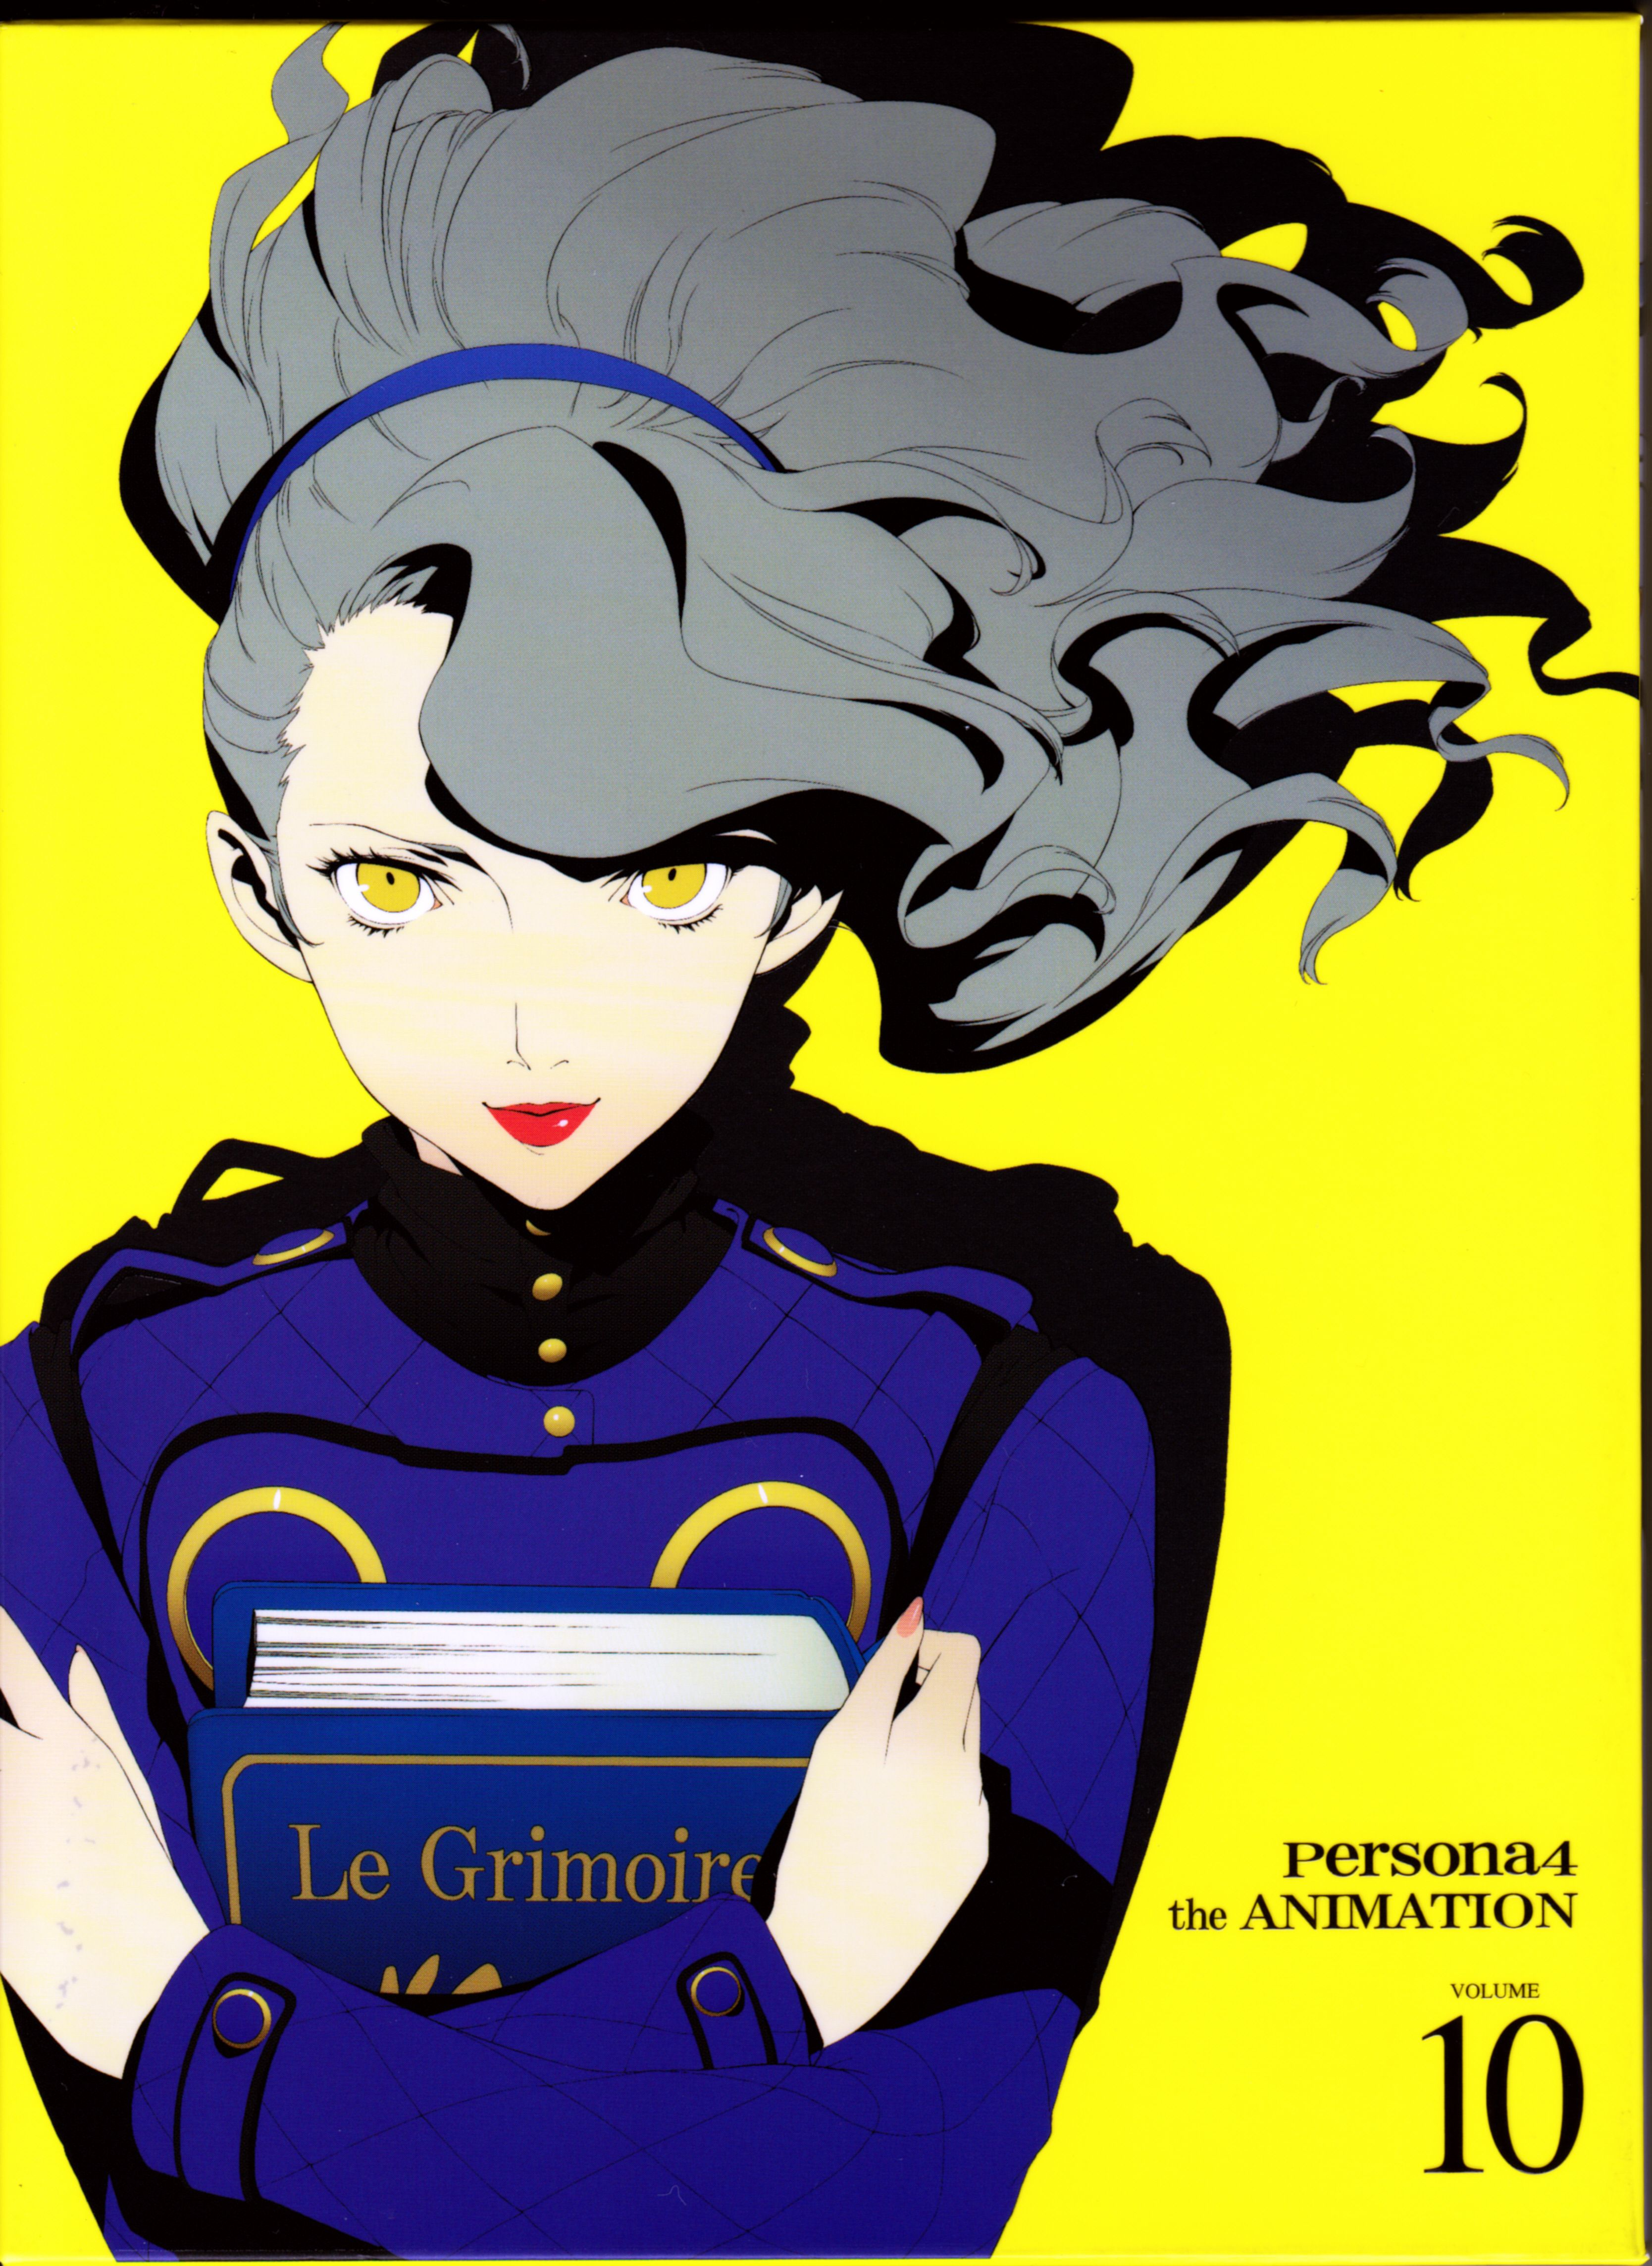 Margaret (PERSONA 4)/#1306302 - Zerochan | Anime Stuff